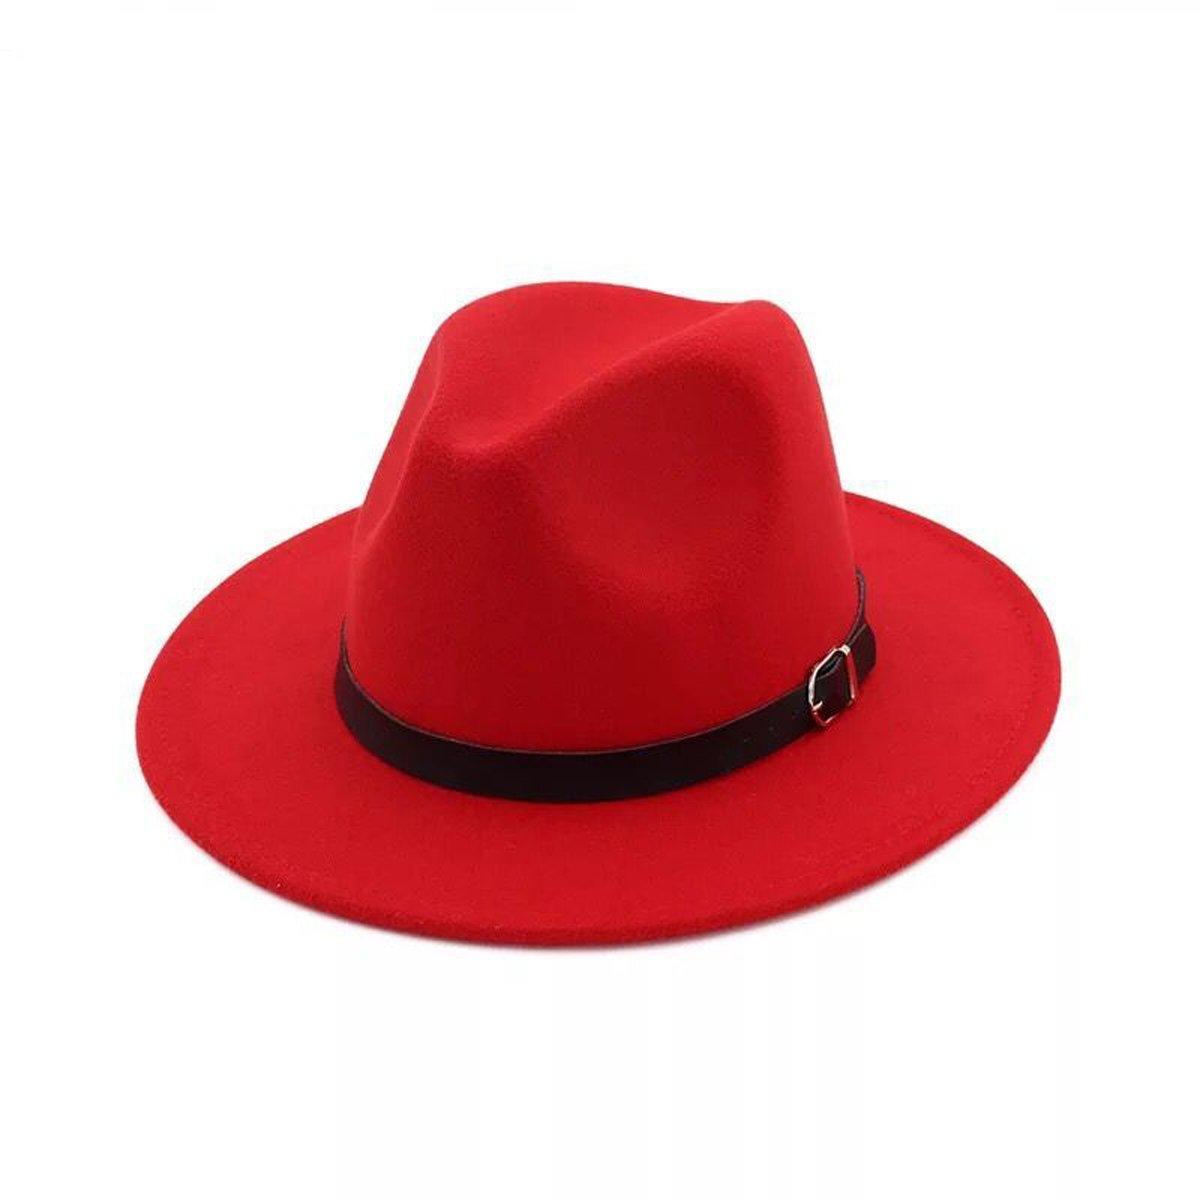 Lanzom Women Retro Style Wide Brim Panama Hat Belt Buckle Wool Fedora Hat One Size)